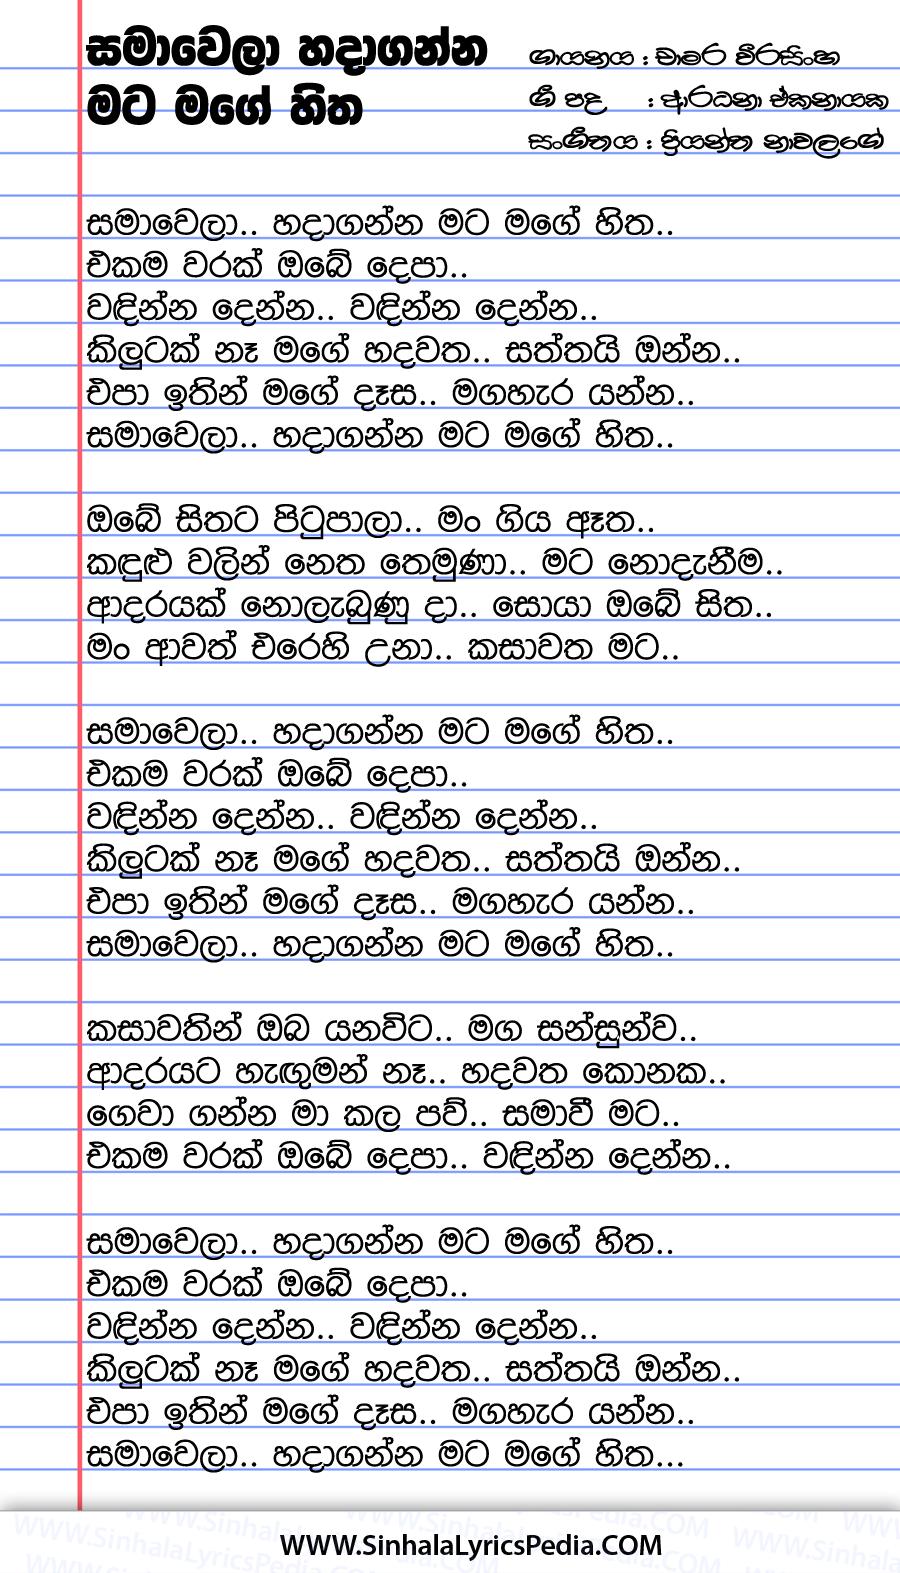 Sama Wela Hadaganna Mata Mage Hitha Song Lyrics